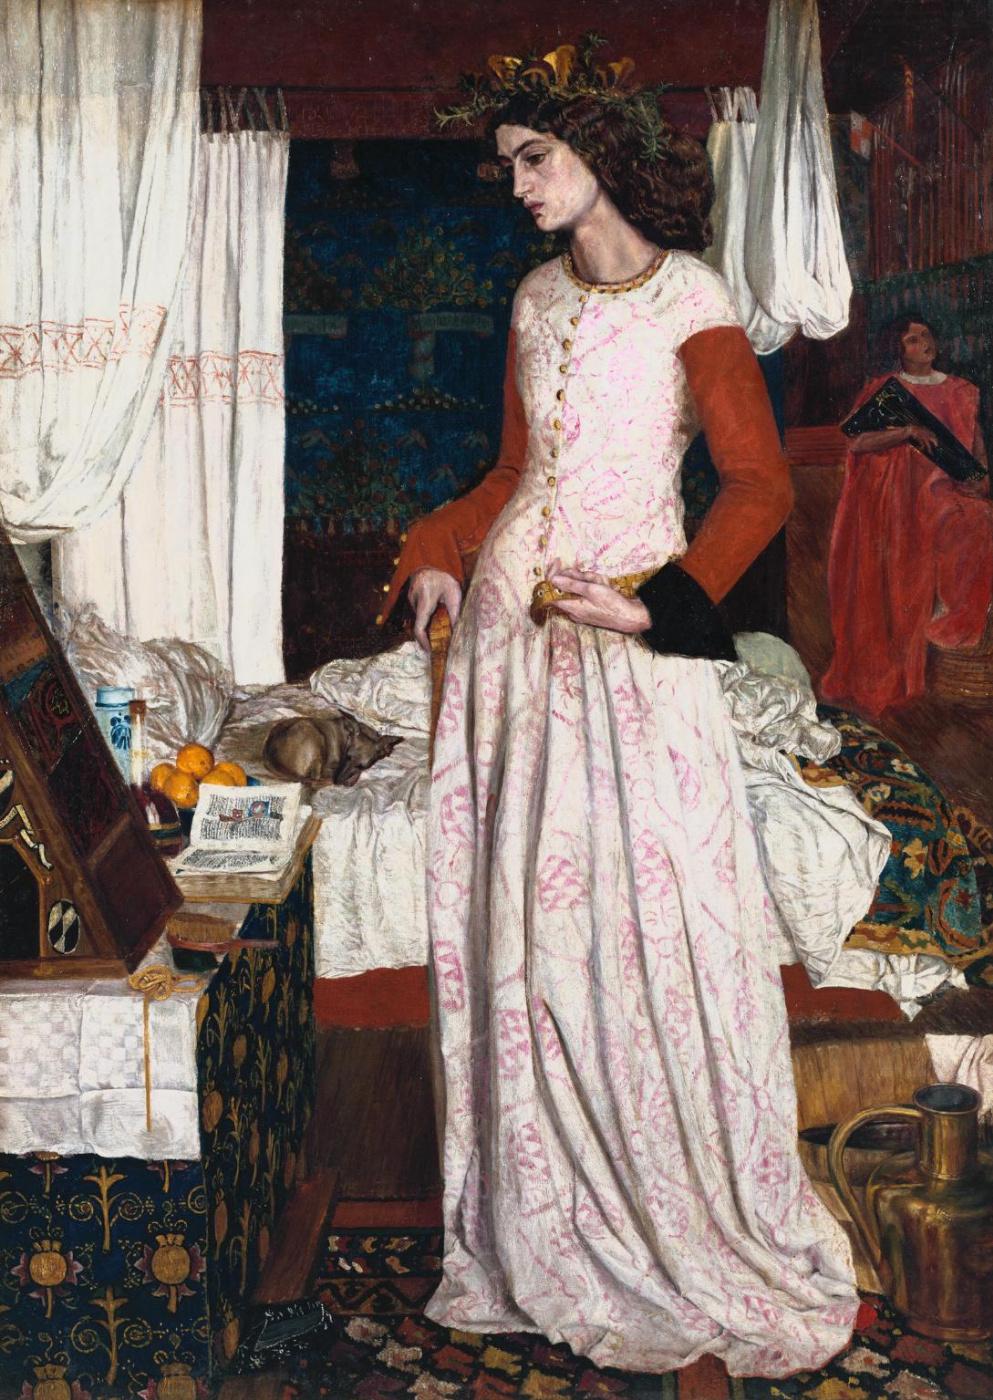 William Morris. Beautiful Isolde (Portrait of the Artist's Wife Jane Morris)